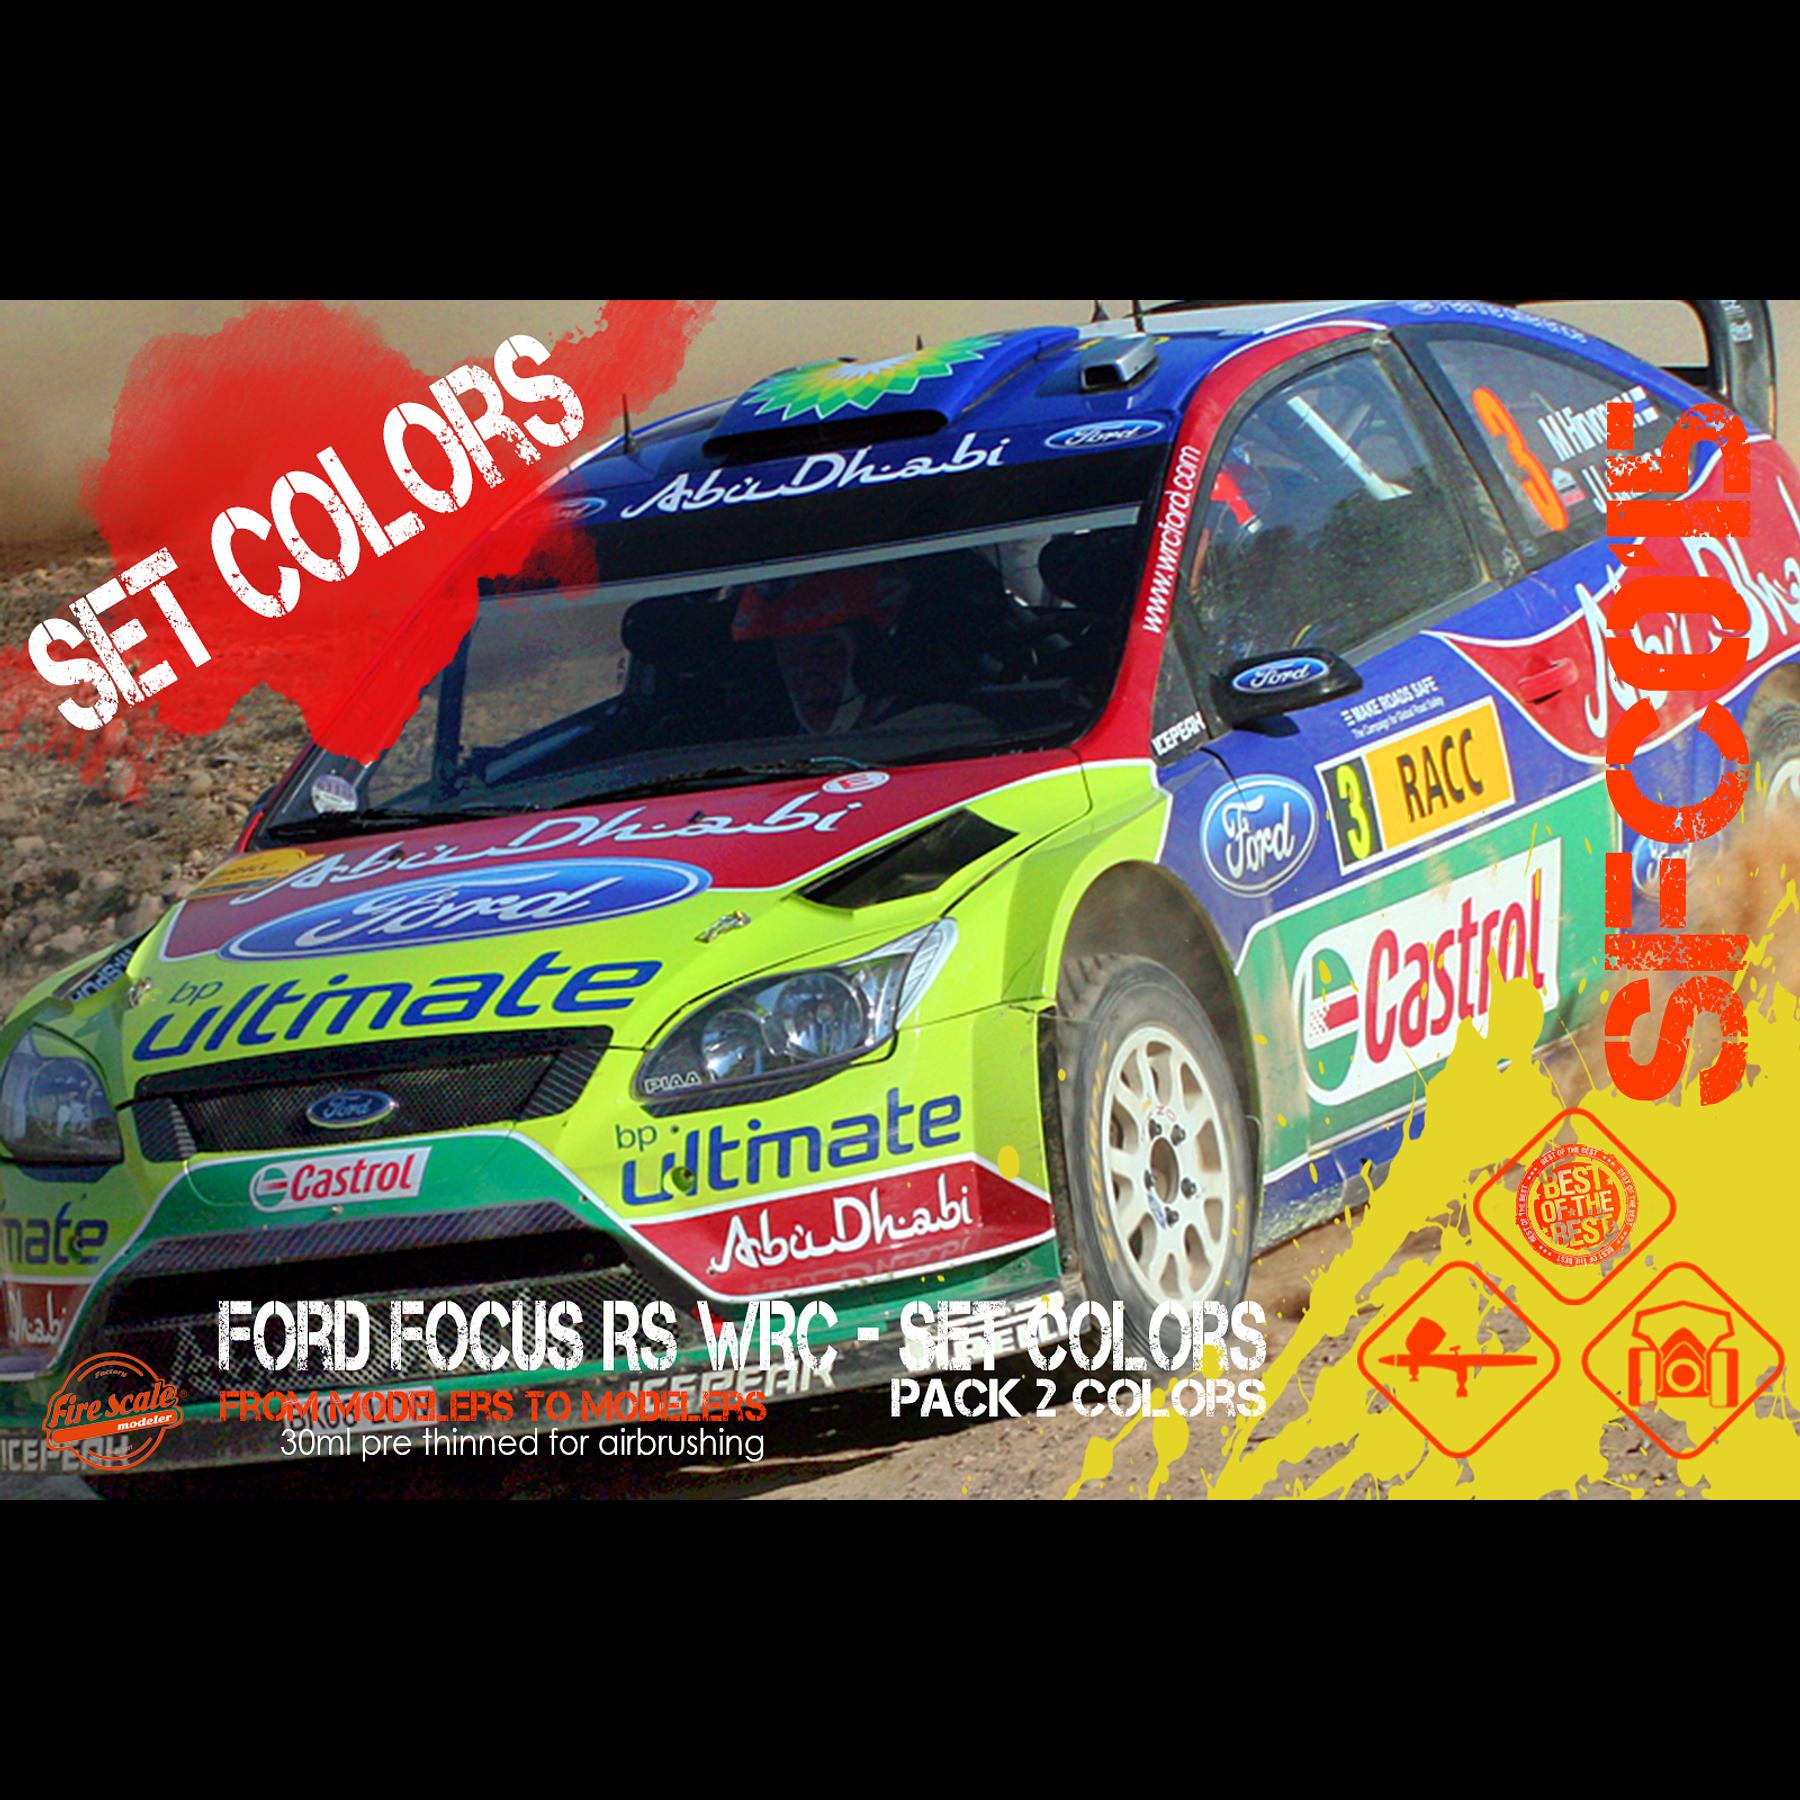 Ford Focus RS WRC - Set Colors